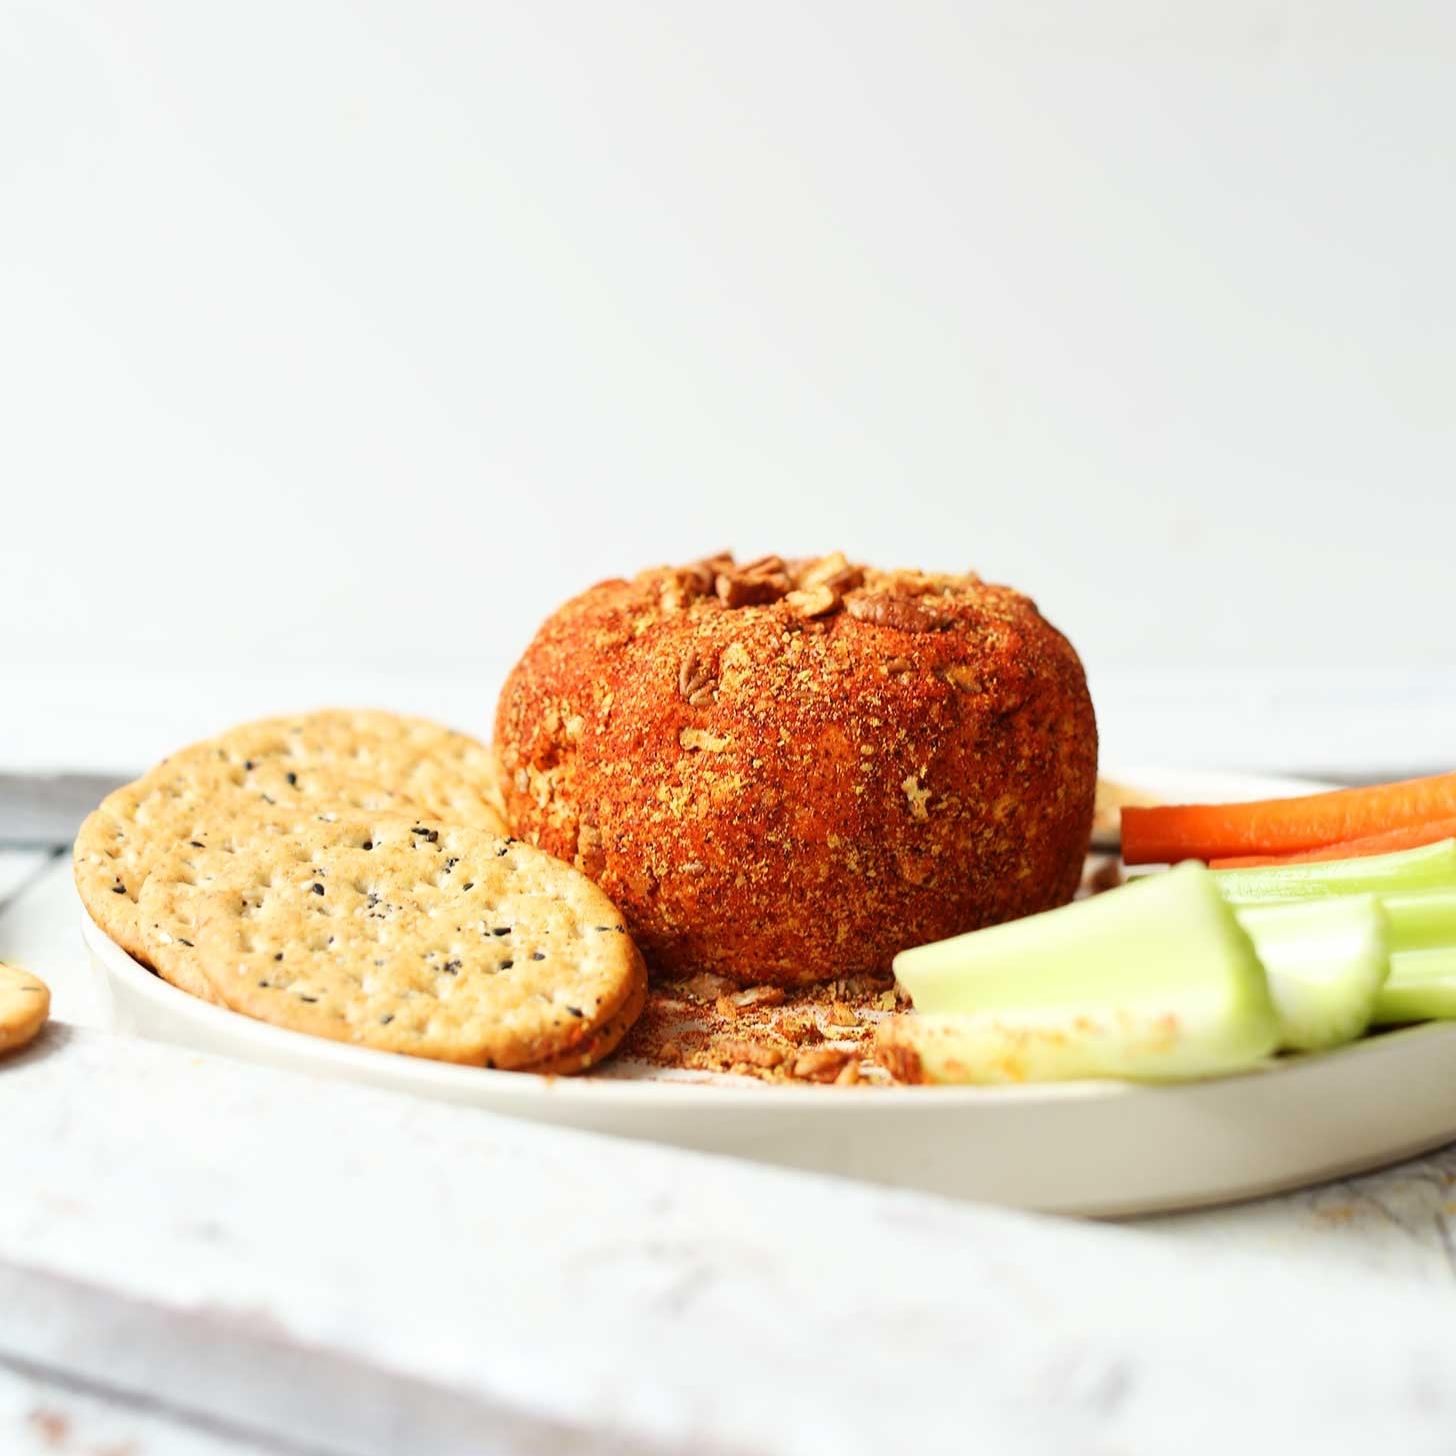 Spicy-Vegan-Cheese-Ball-Perfect-for-the-holidays-vegan-glutenfree-cheeseball-recipe-snack.jpg